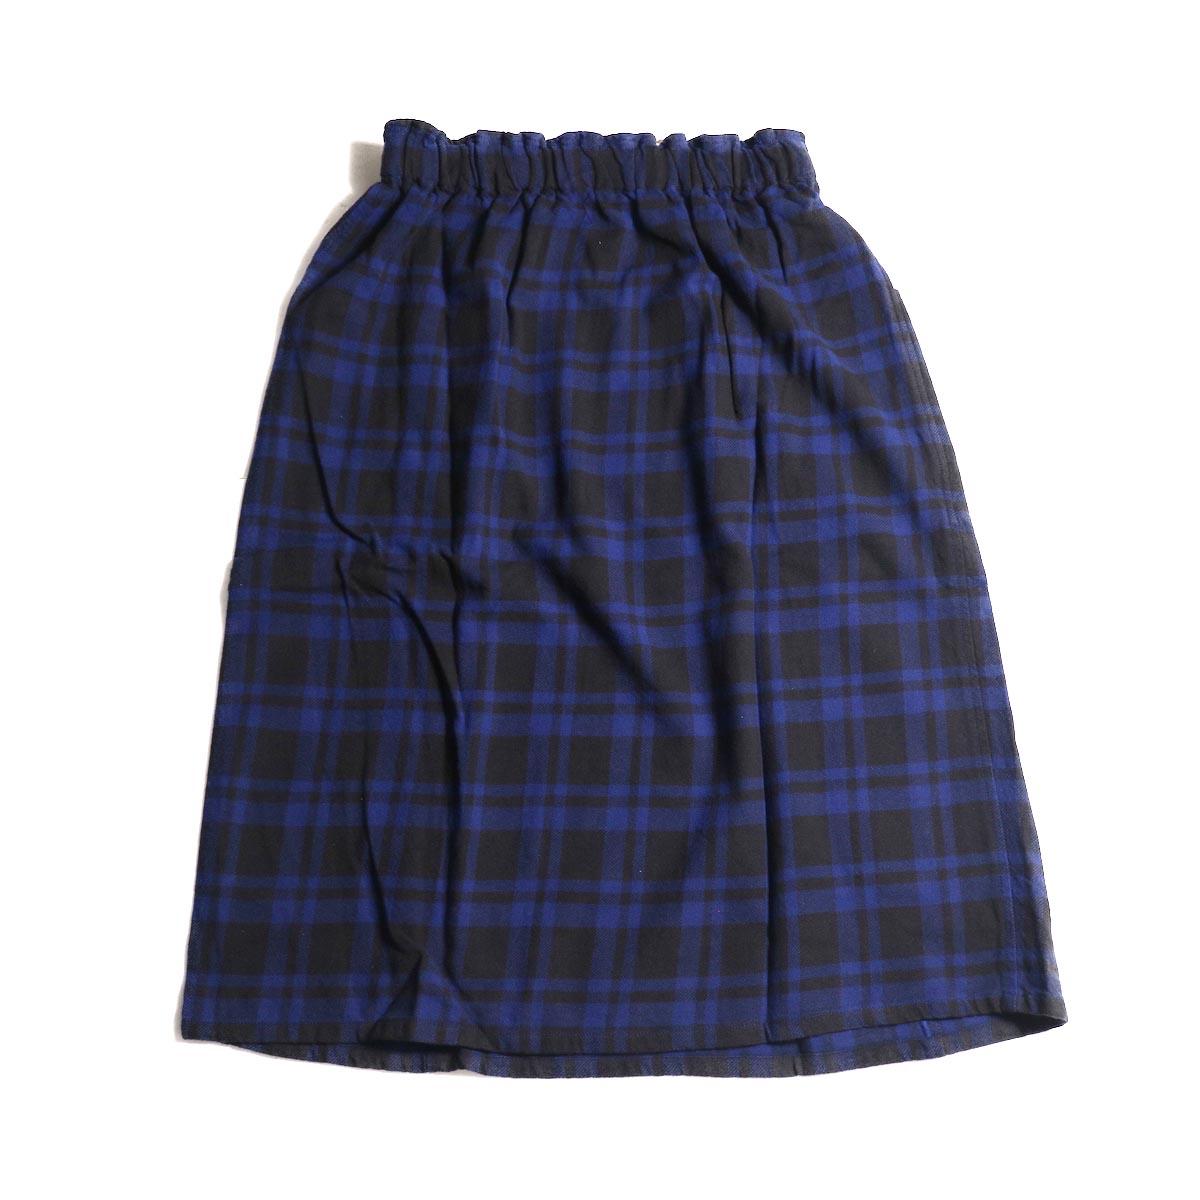 SOUTH2 WEST8 / Army String Skirt -Plaid Twill (Blue/Black)背面